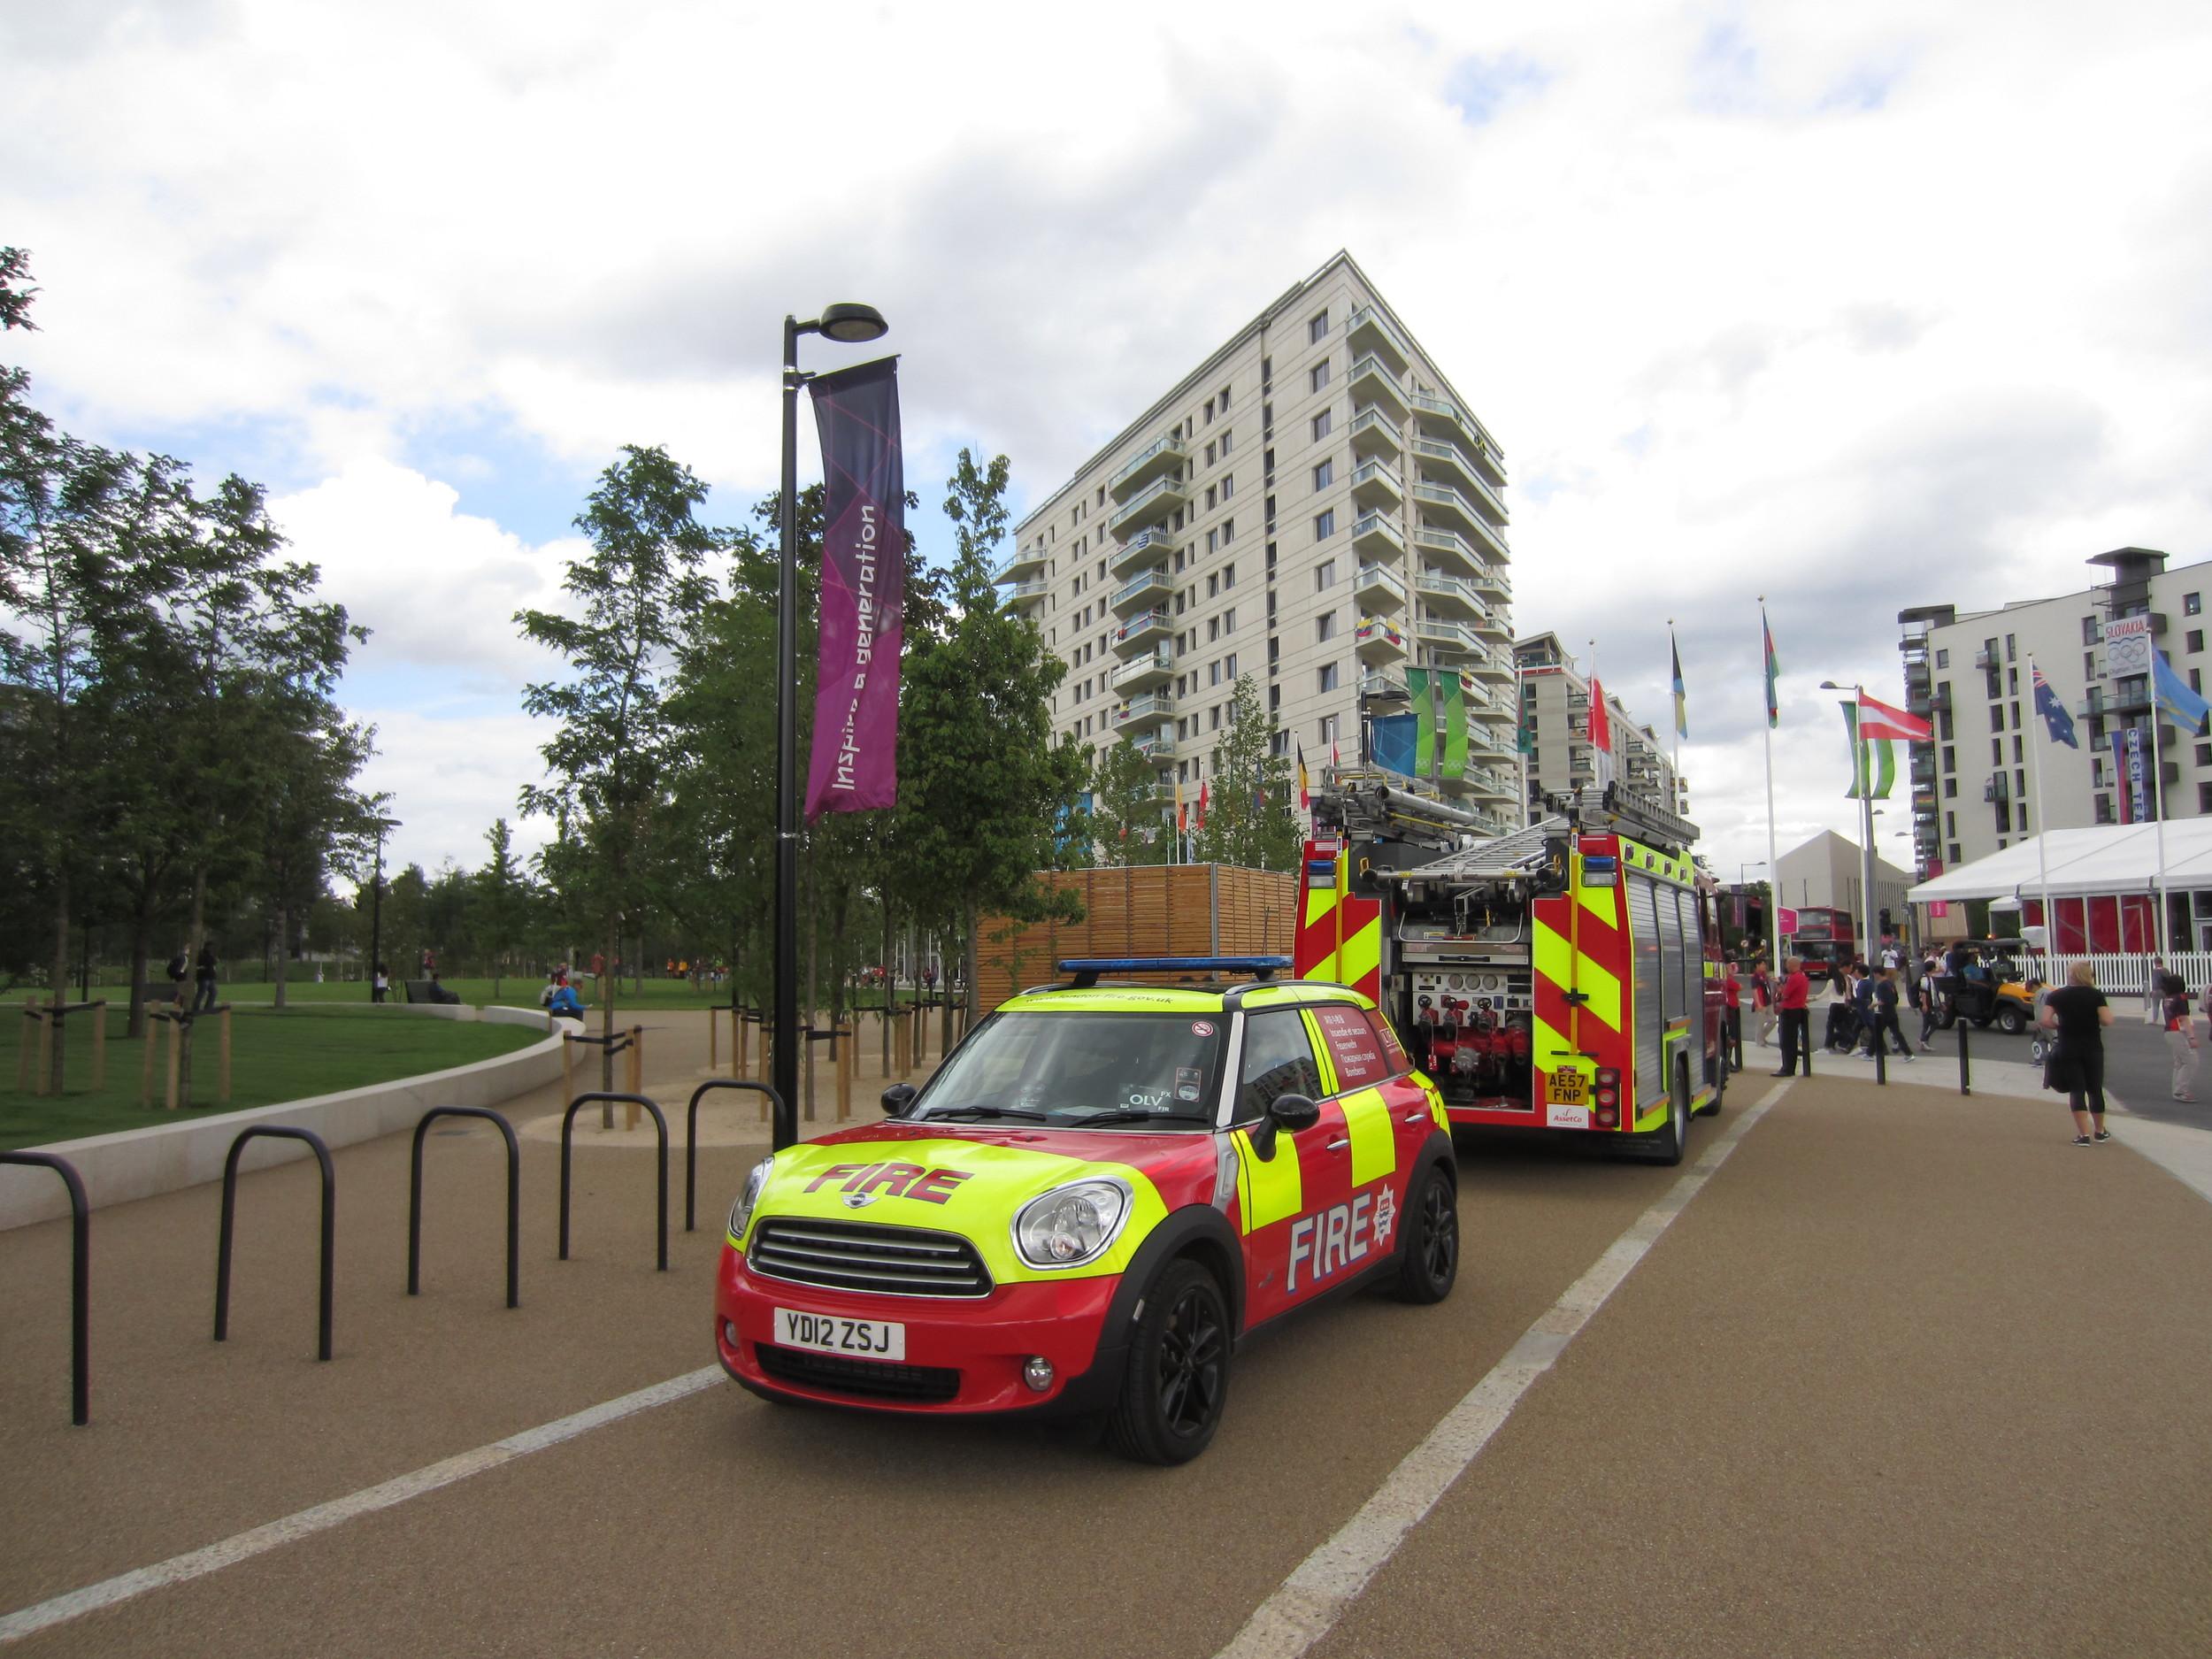 London 2012 - Athletes' Village